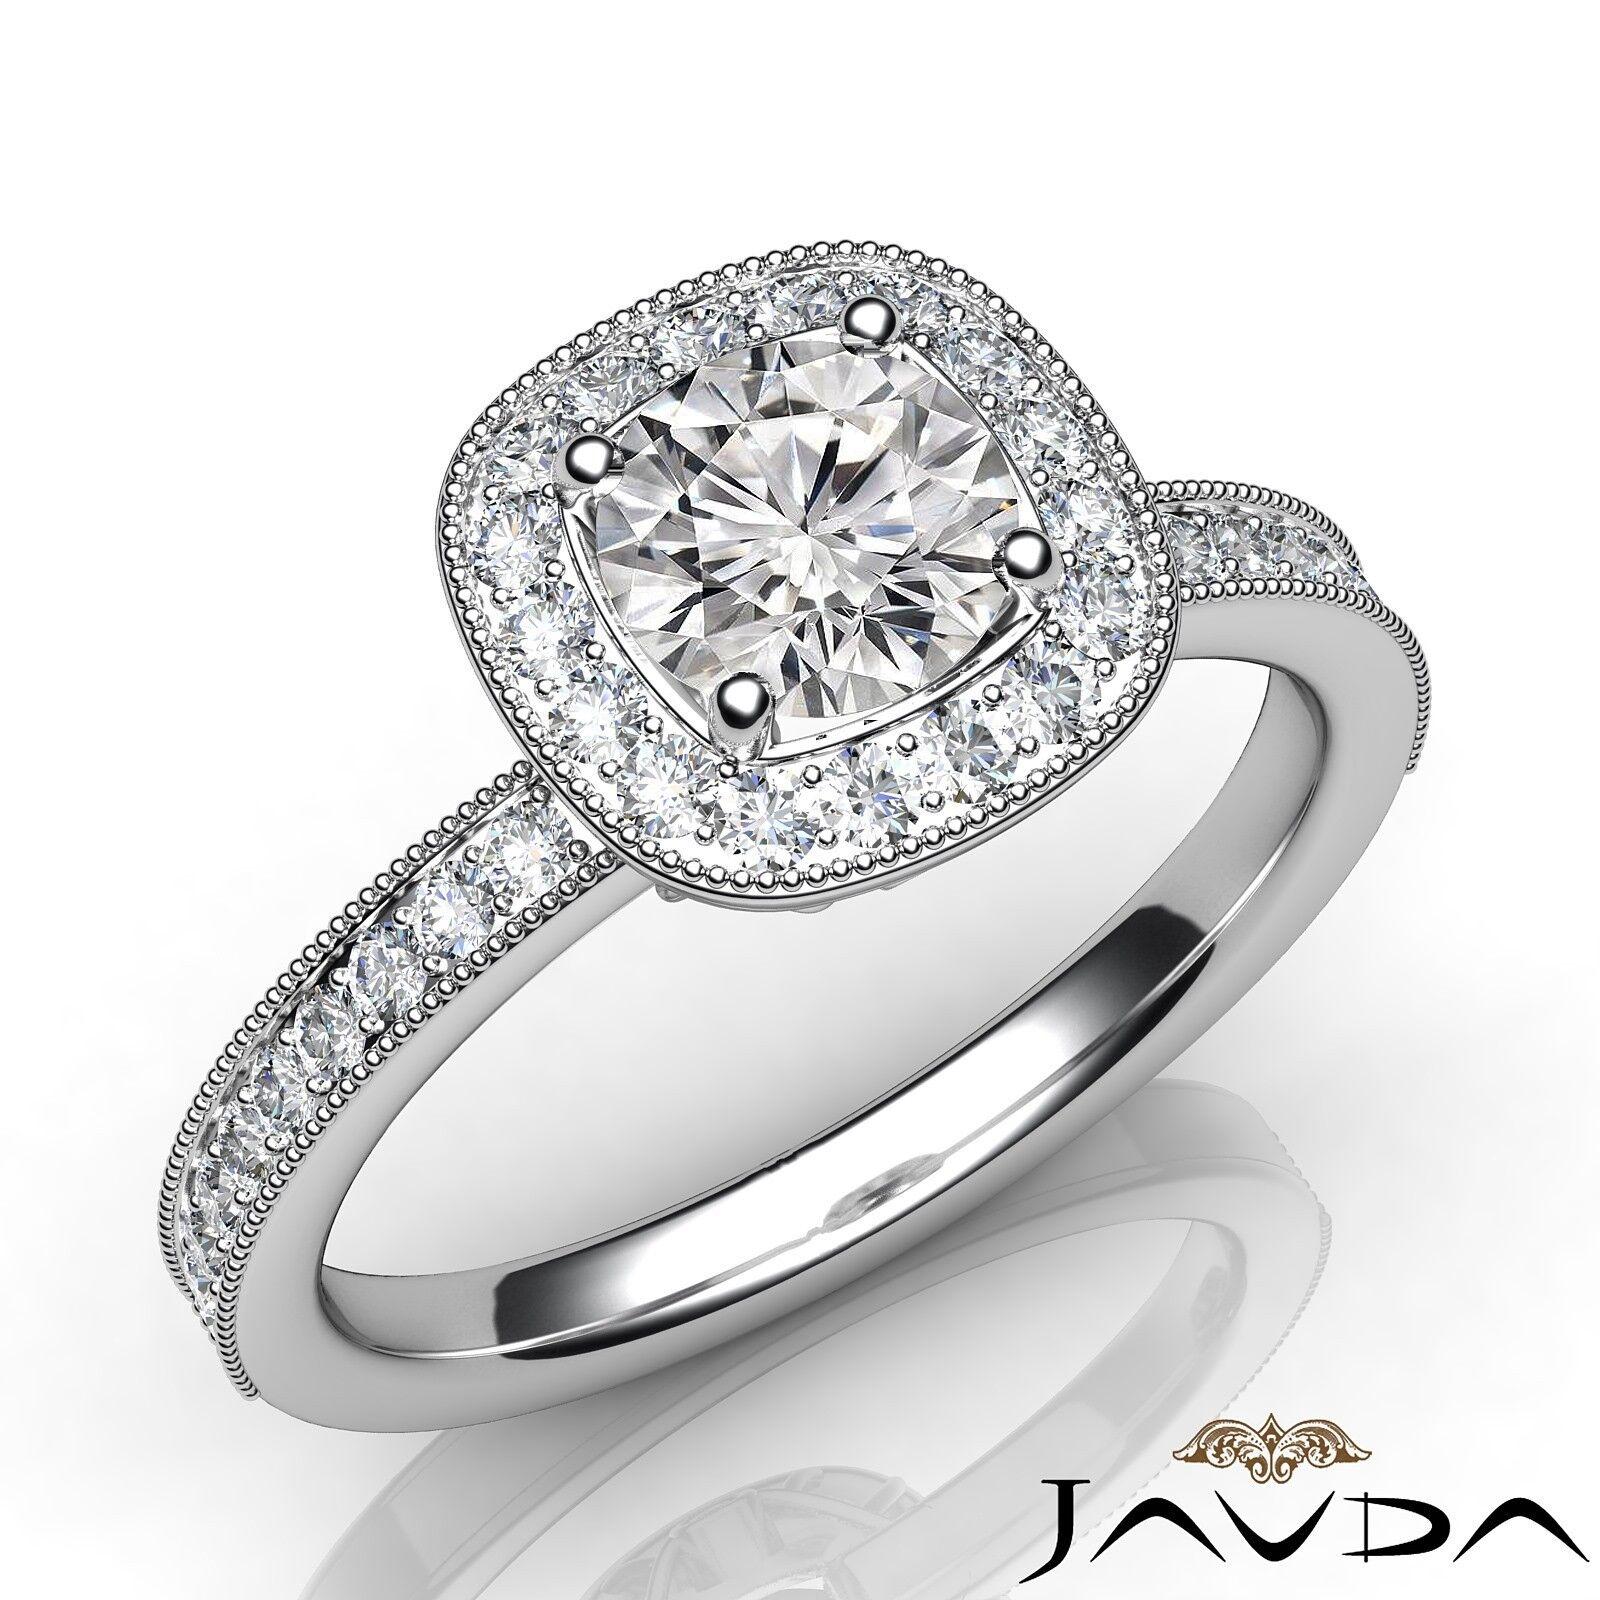 0.95ctw Certified Stone Round Diamond Engagement Ring GIA E-VVS2 White Gold New